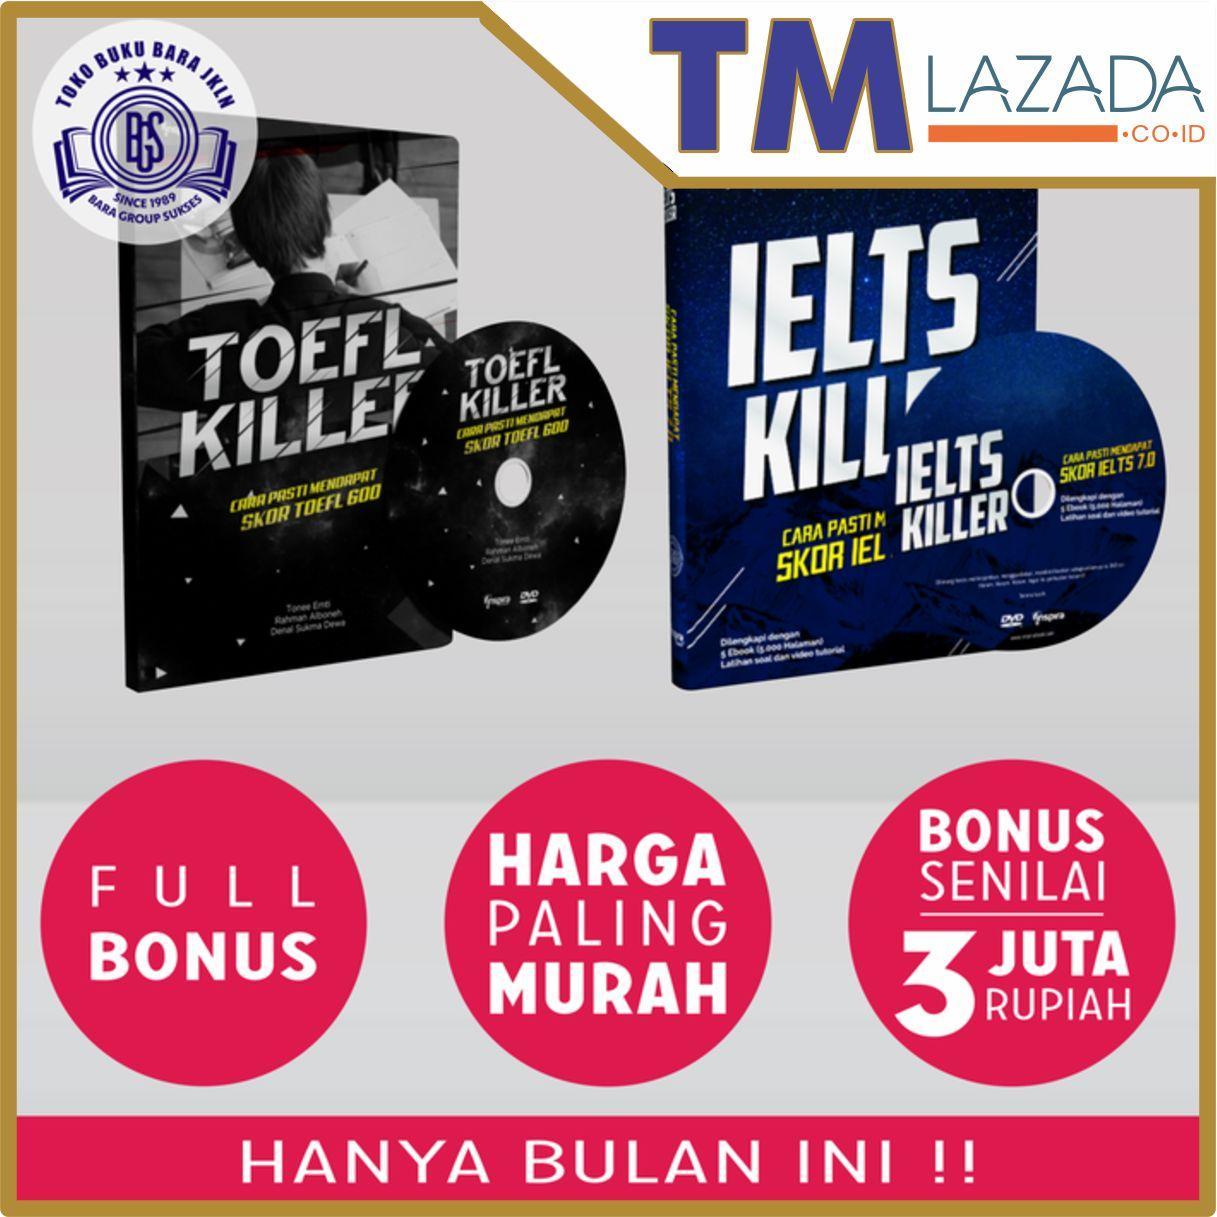 Buku + DVD Ielts Killer & Toefl Killer Terlaris di Lazada